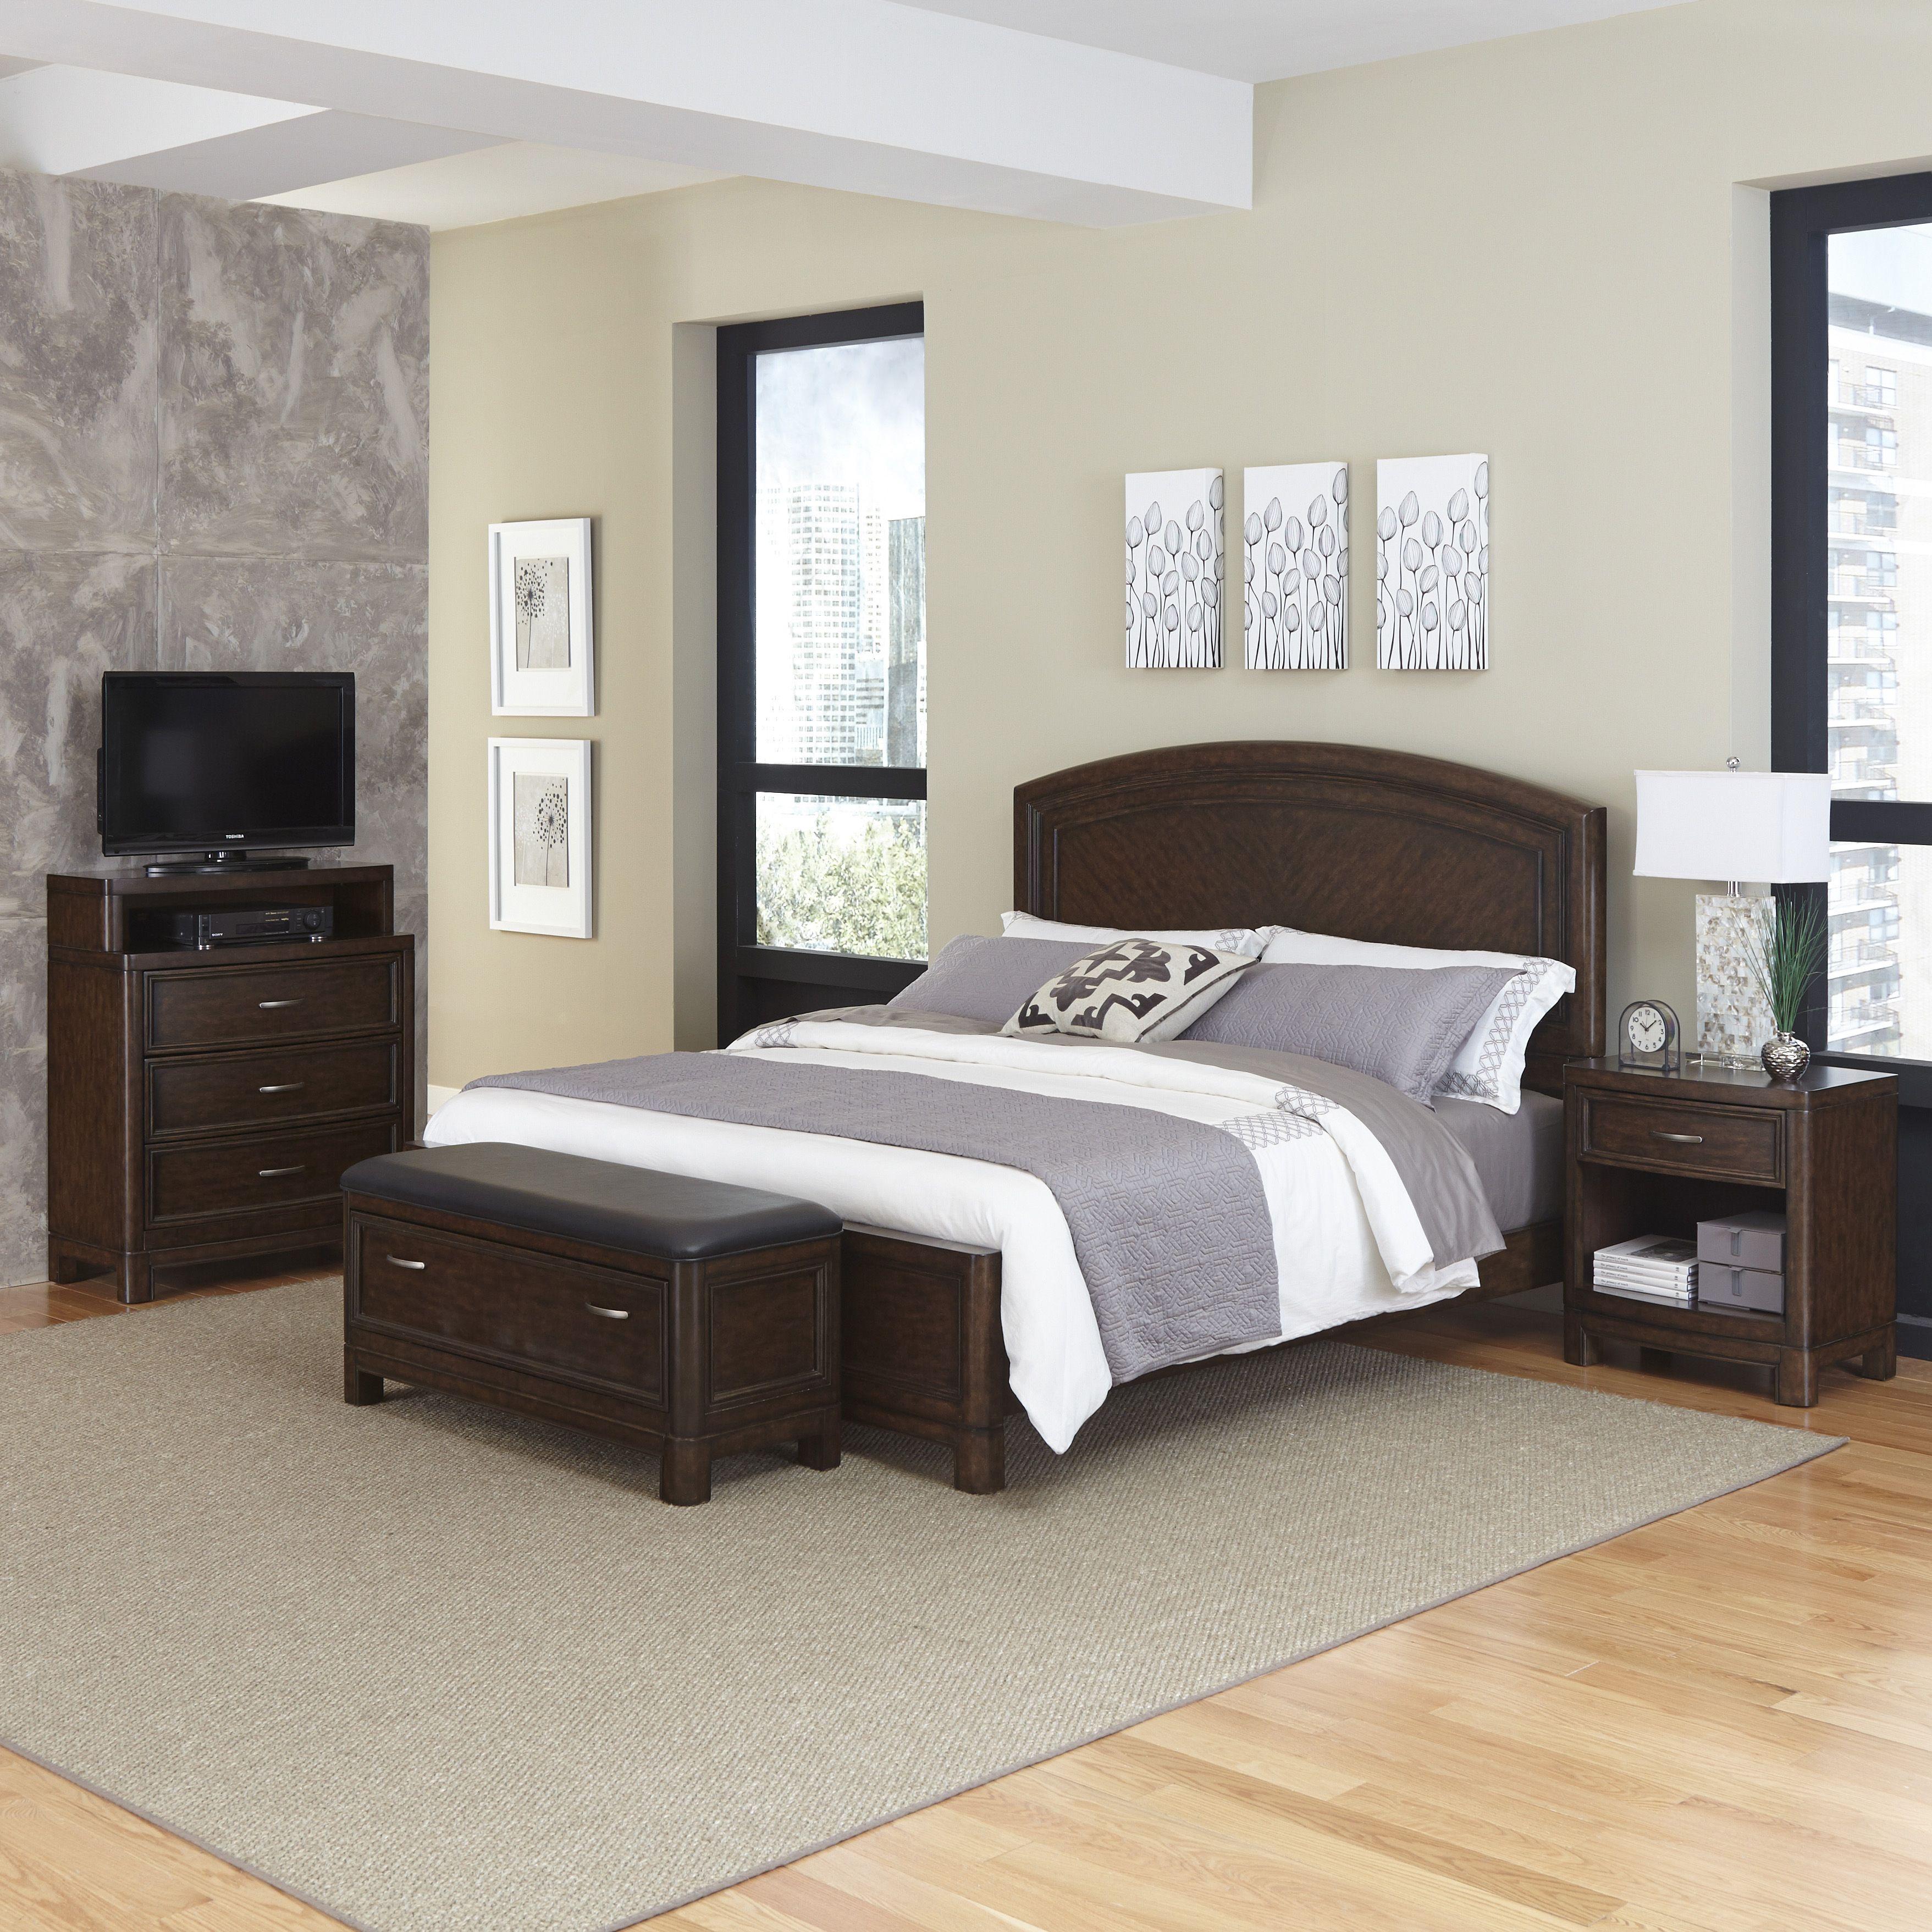 nebraska ideas mart sets furniture bedroom queen beautiful